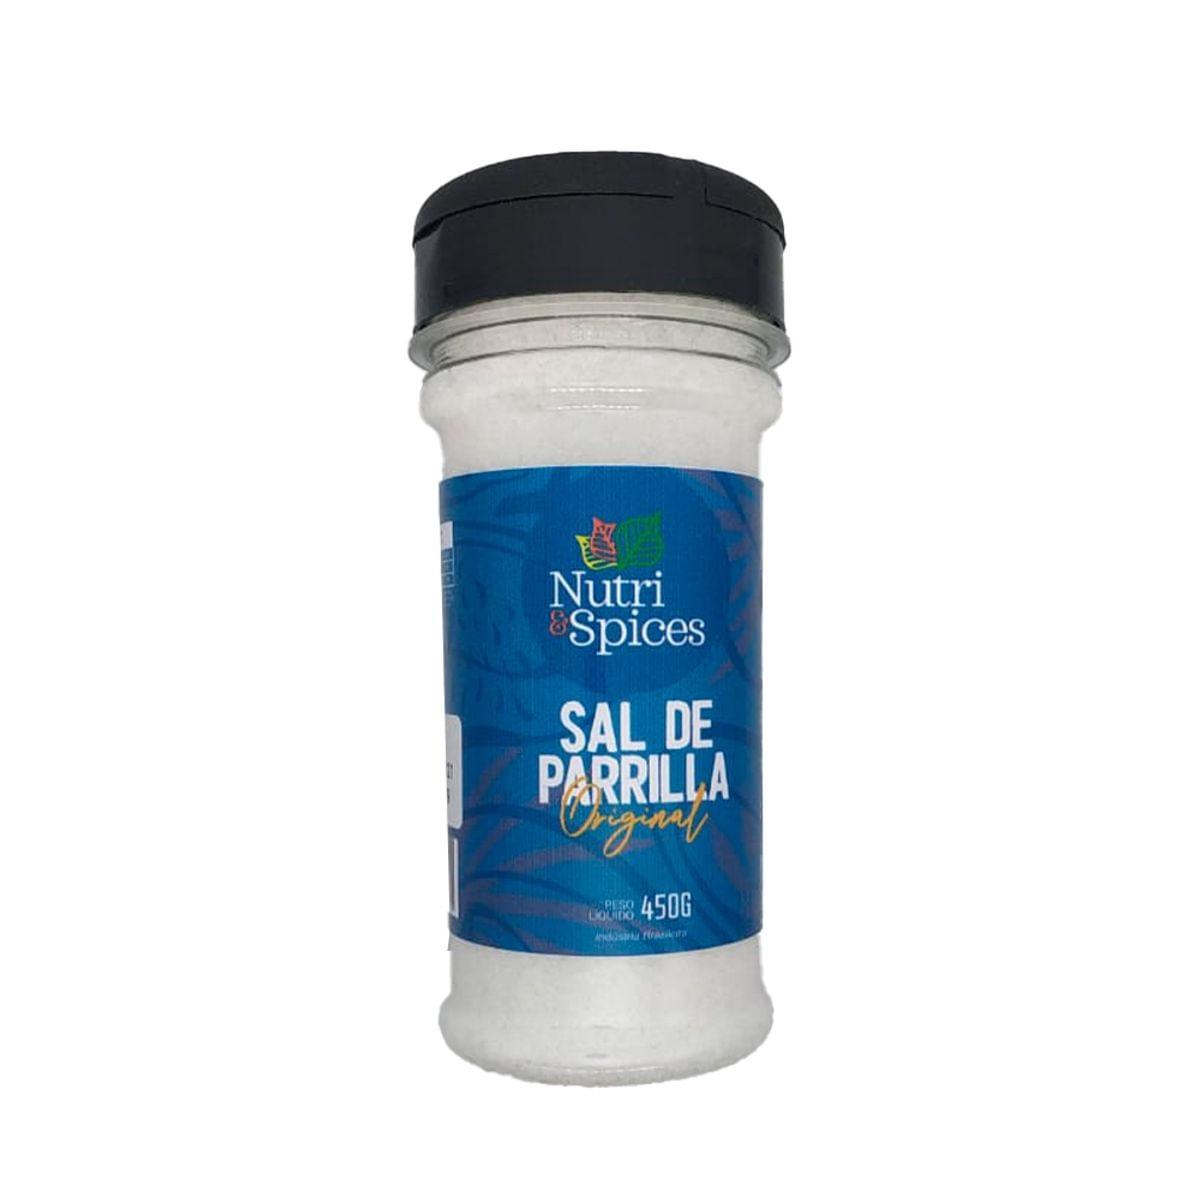 Sal-De-Parrilla-Nutri-Spices-Pote-450g